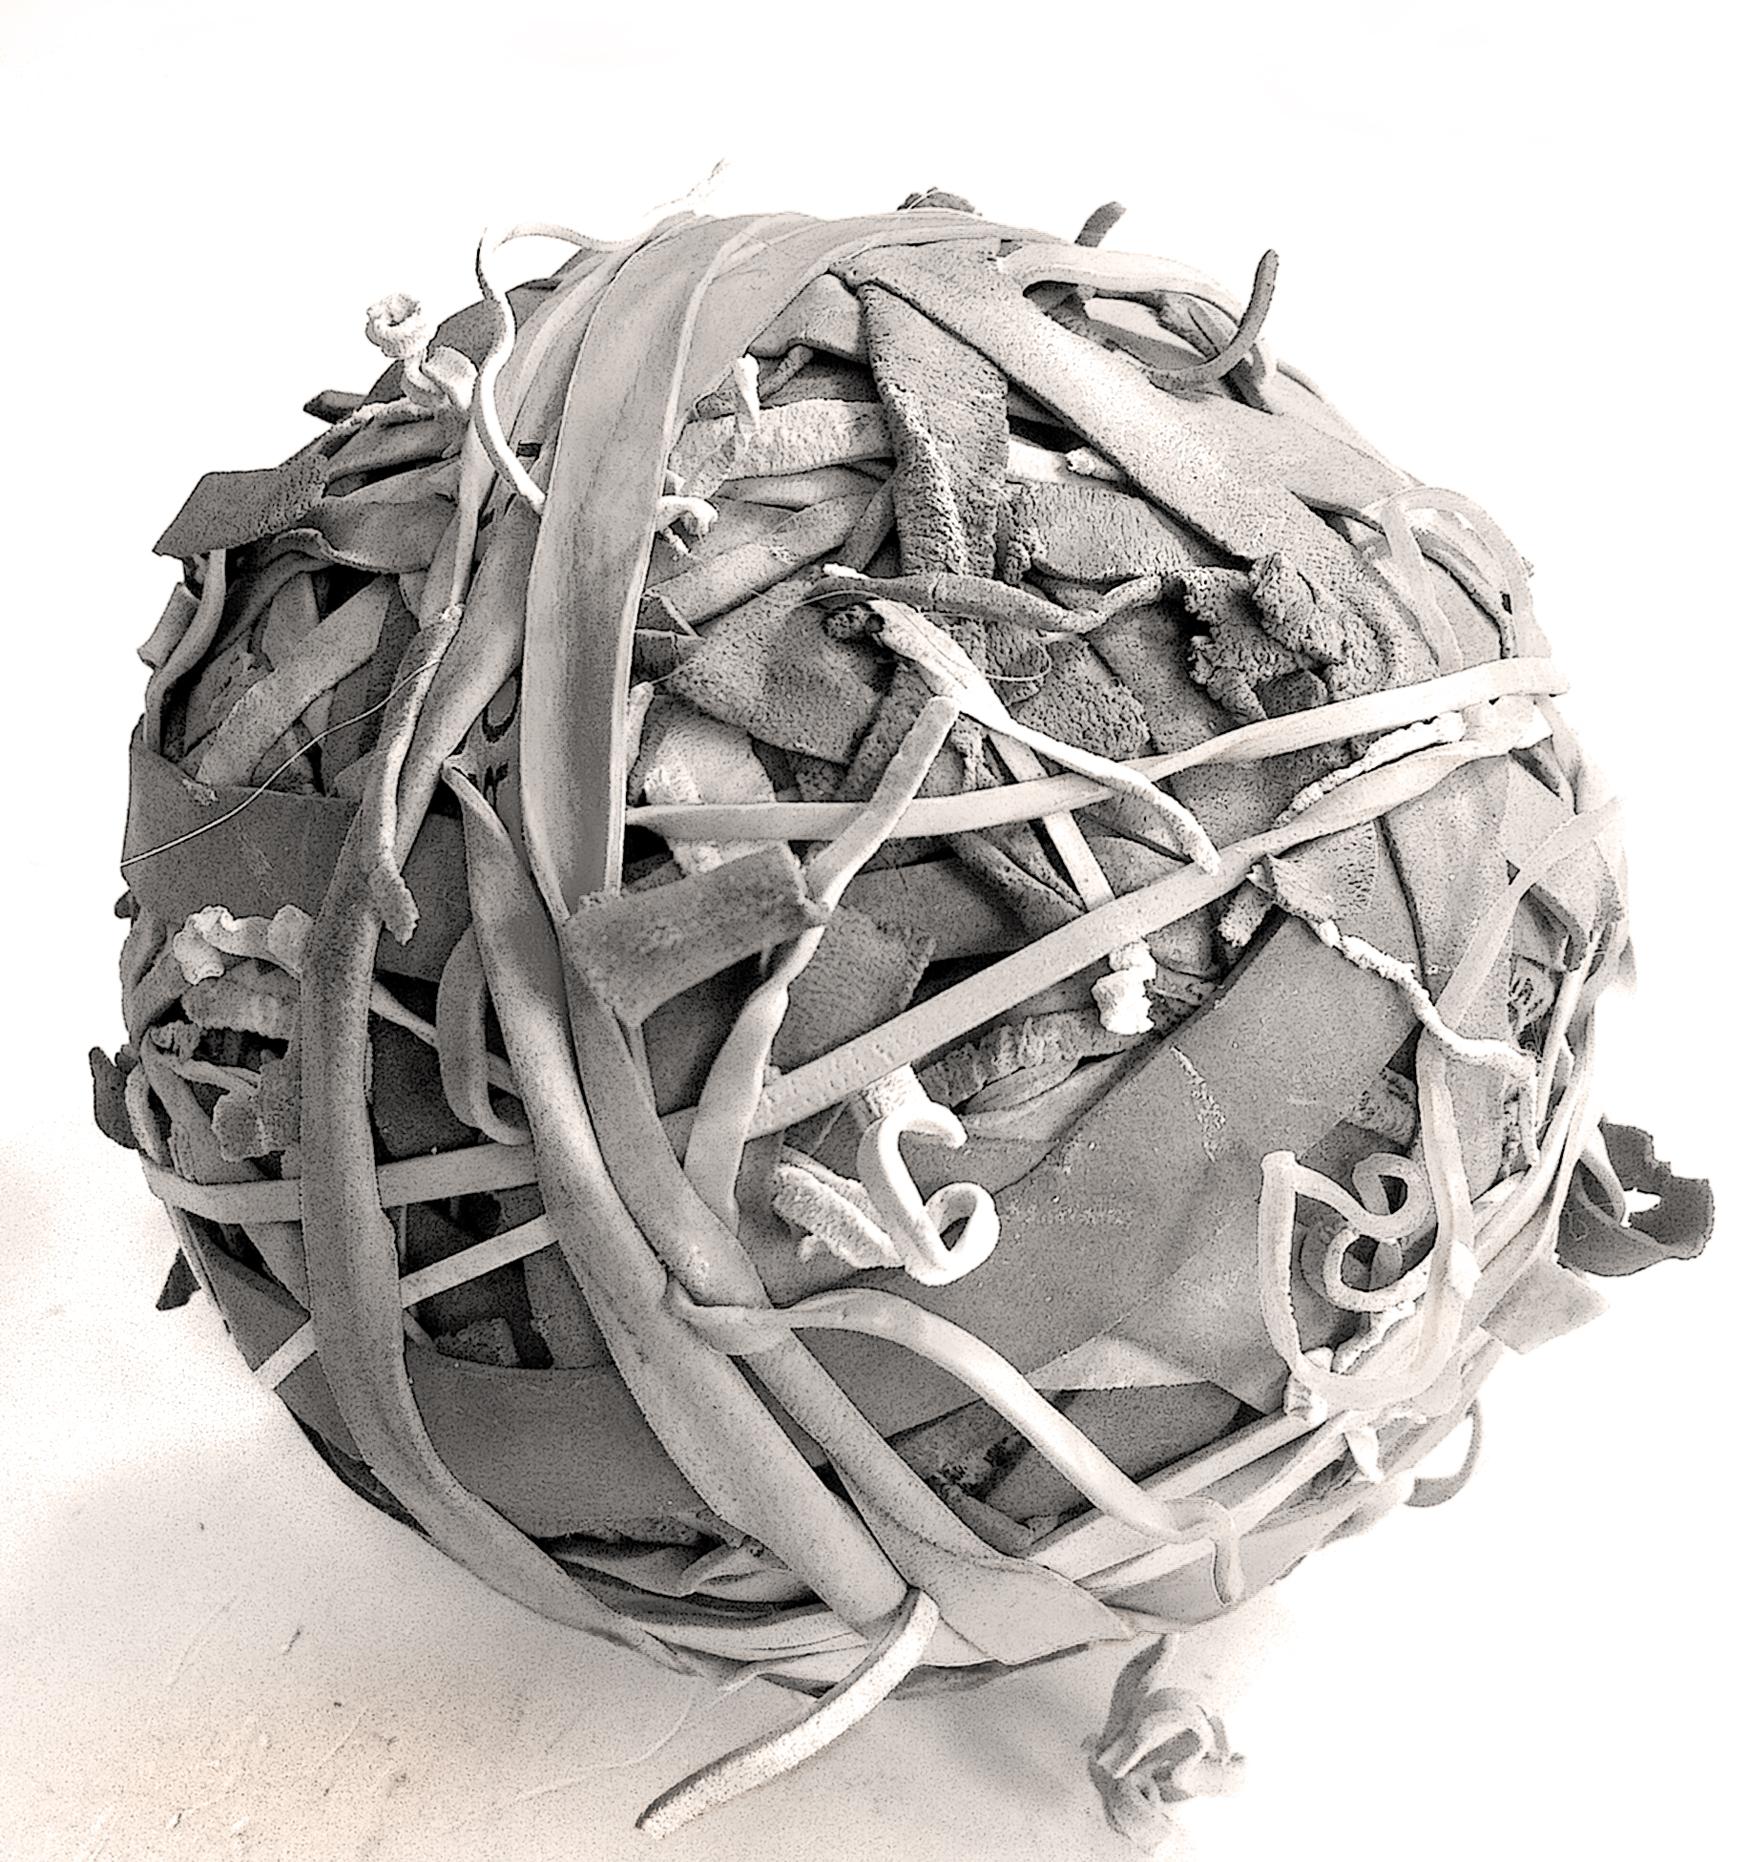 Ilana's rubber band ball